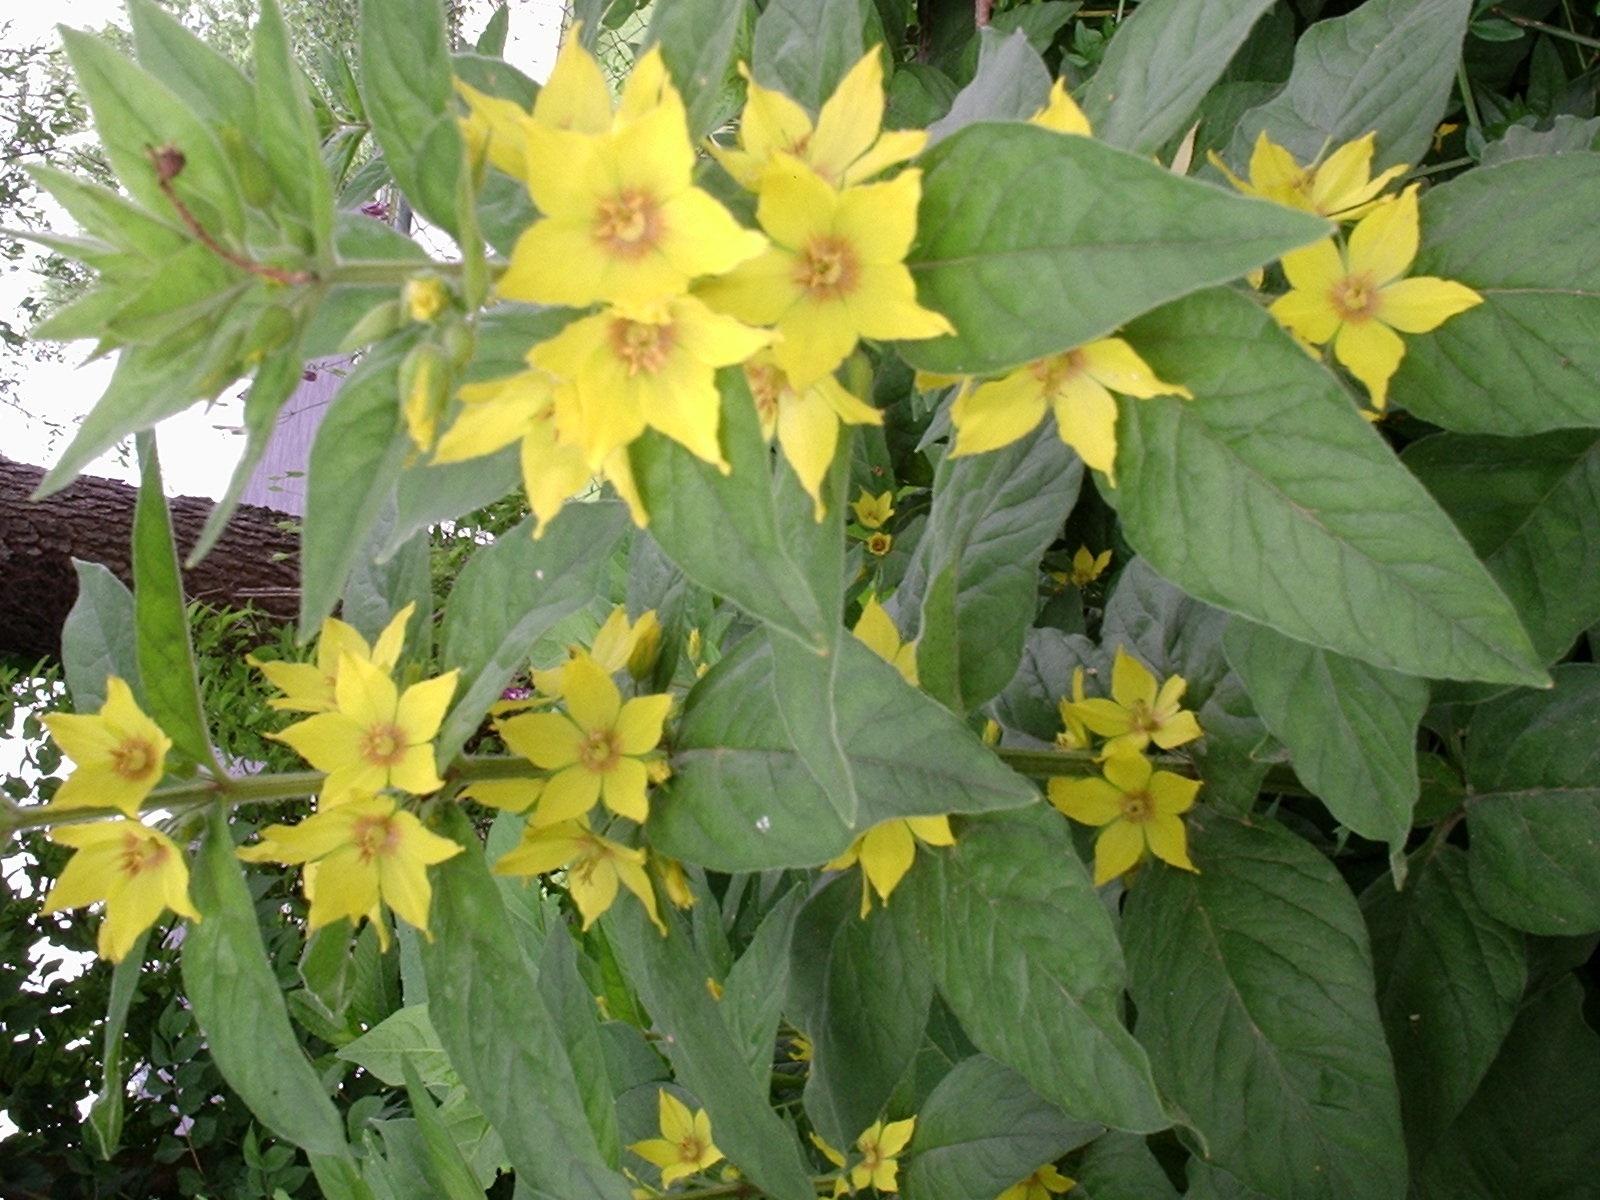 Tall yellow perennial flowers gallery fresh lotus flowers yellow flowering perennials choice image flower decoration ideas mightylinksfo